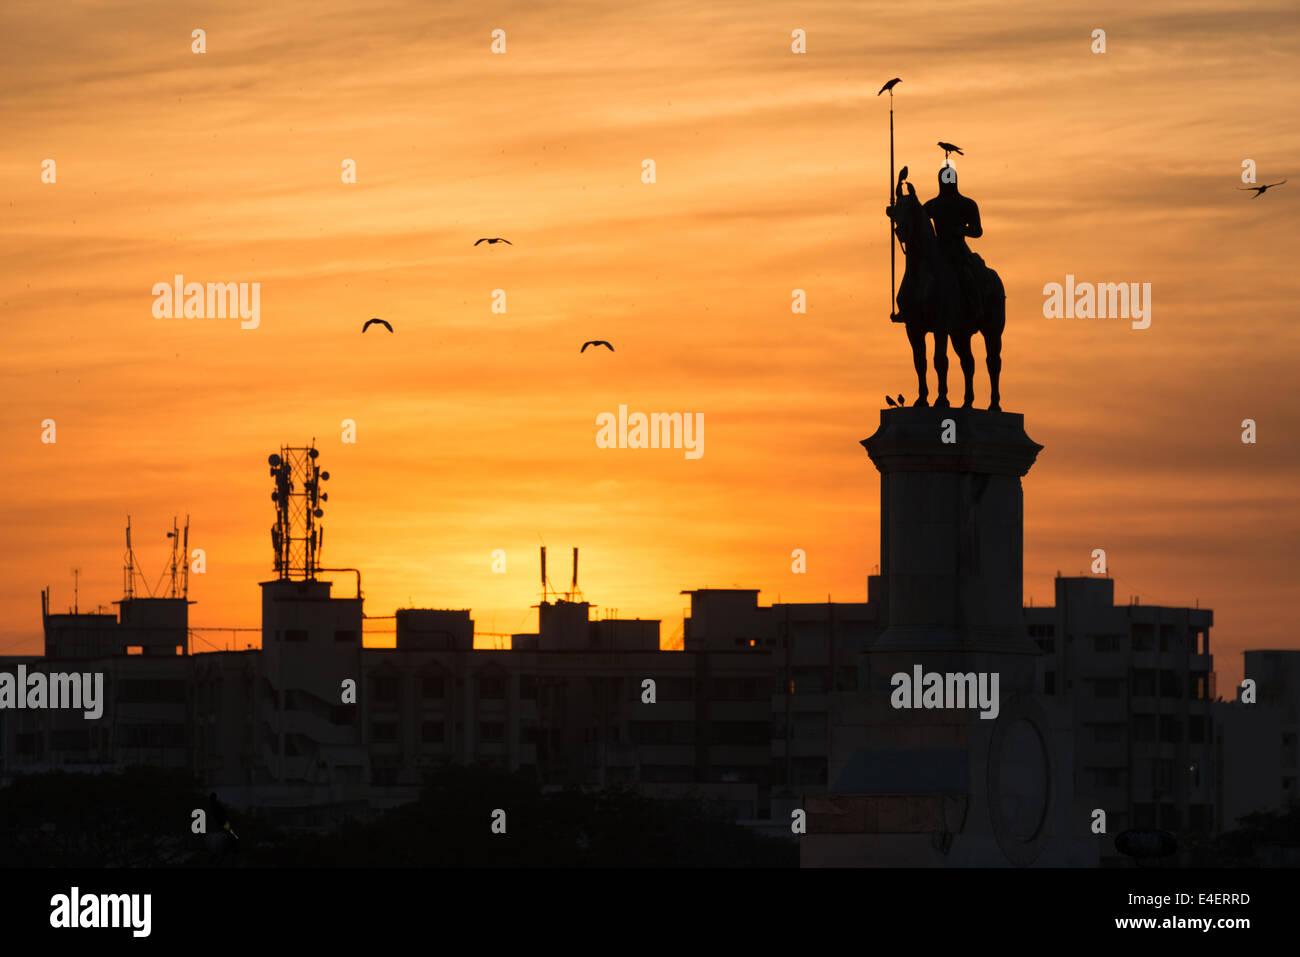 The statue of Maharana Ranjit singh in Jamnagar, Gujarat. - Stock Image